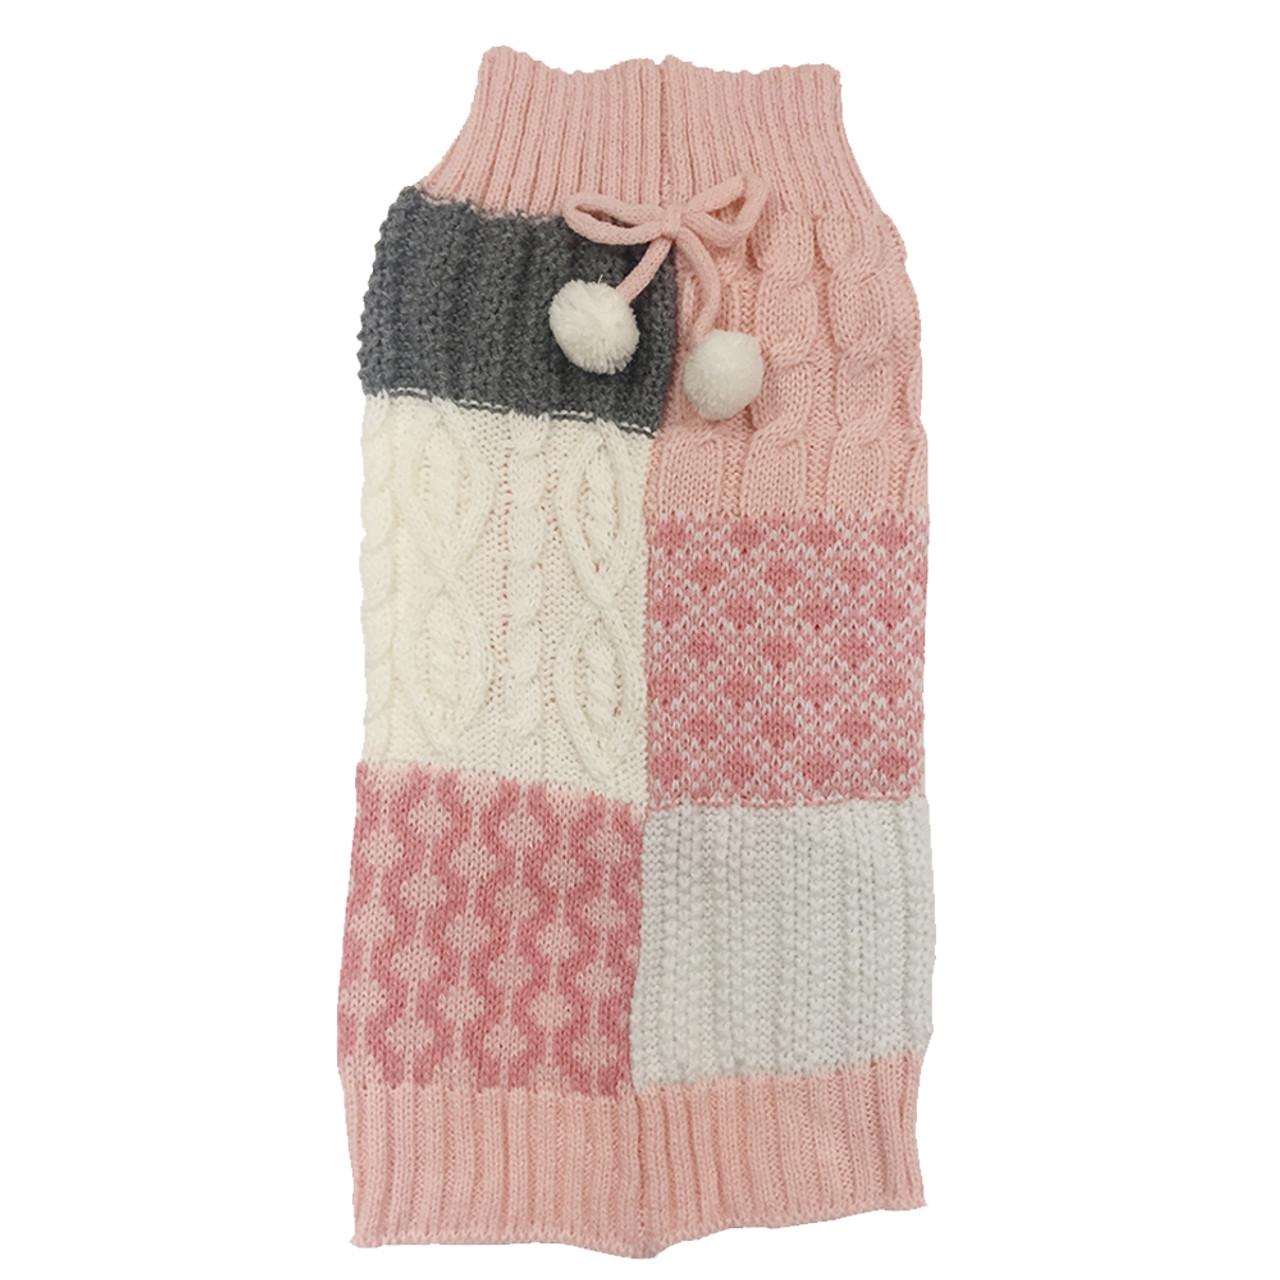 SimplyDog Pink Gray Mixed Knit Dog Sweater